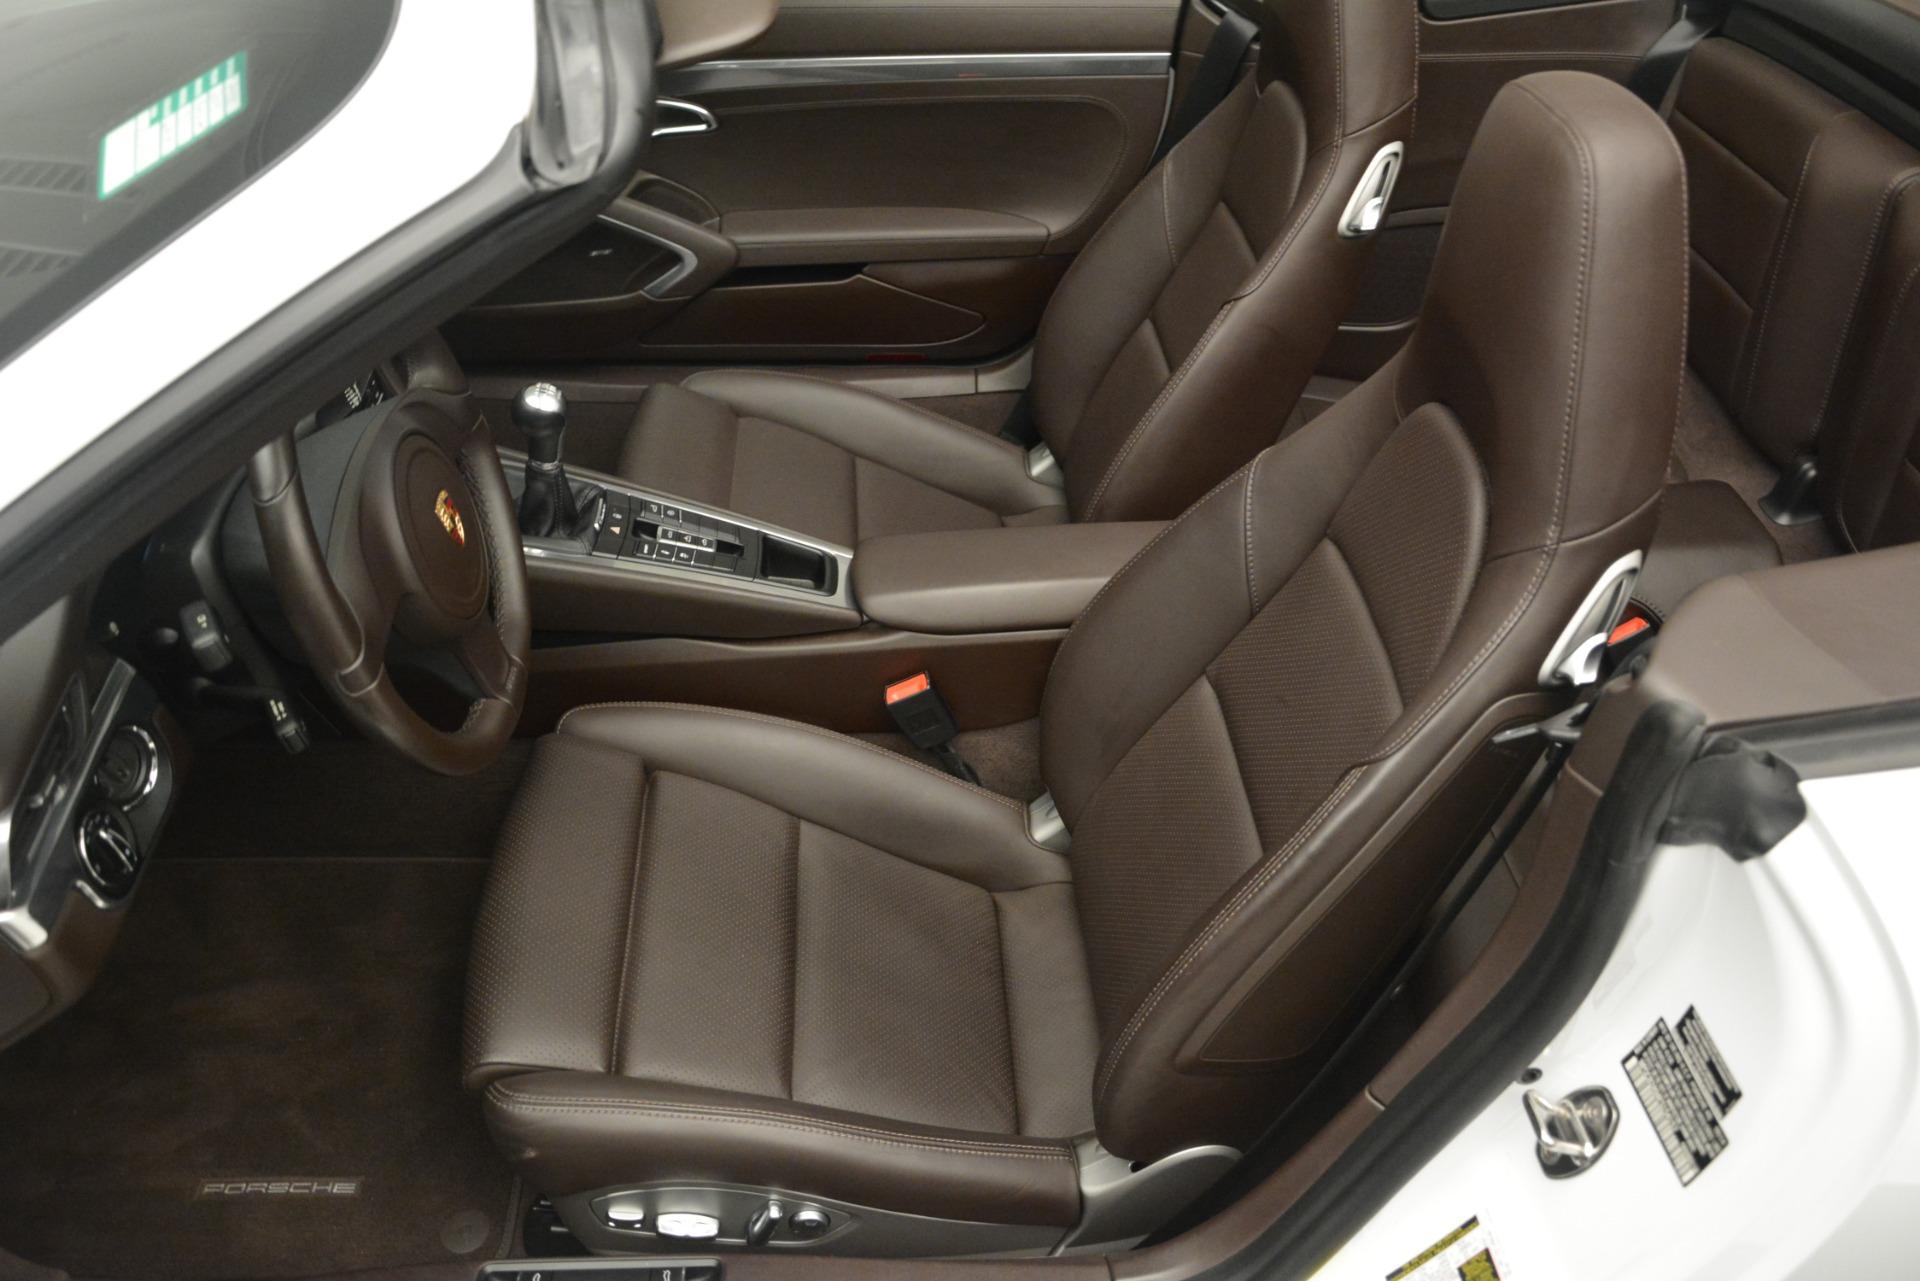 Used 2015 Porsche 911 Carrera S For Sale 0 In Greenwich, CT